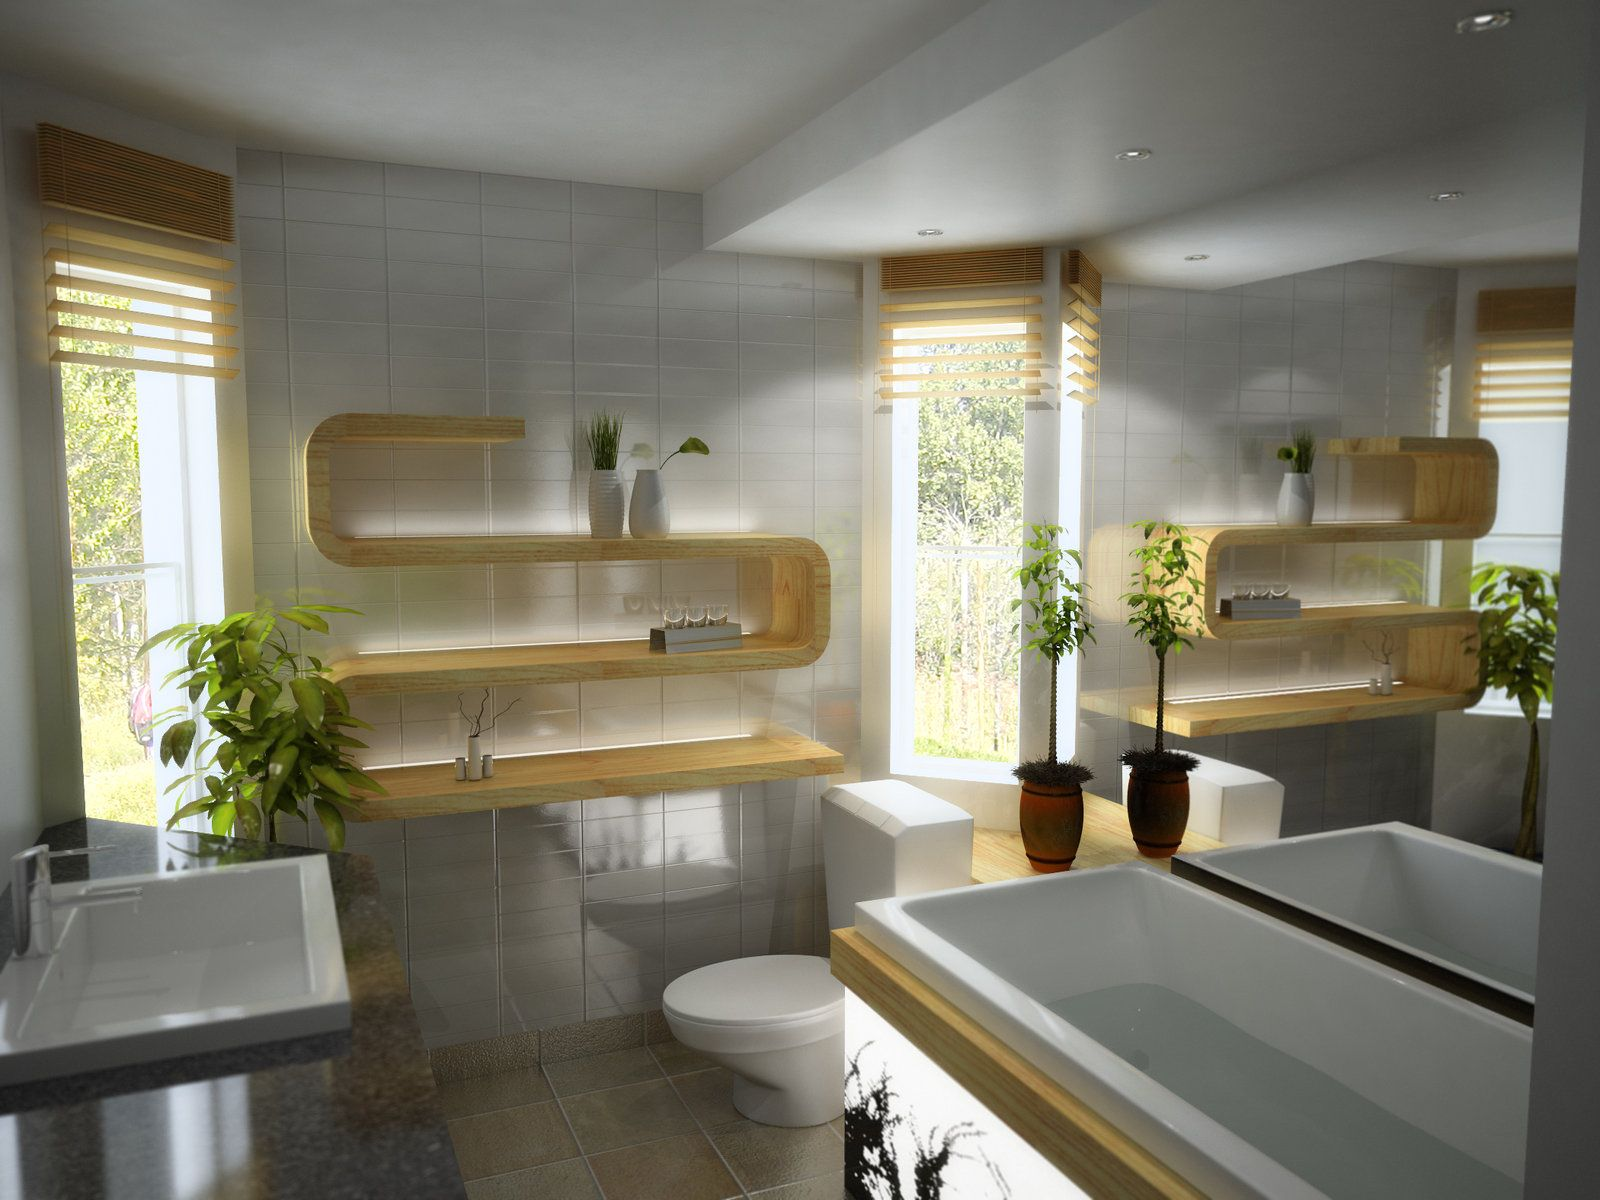 Top 10 Stylish Bathroom Design Ideas  Bathroom Designs Large Awesome Top Bathroom Designs Design Ideas